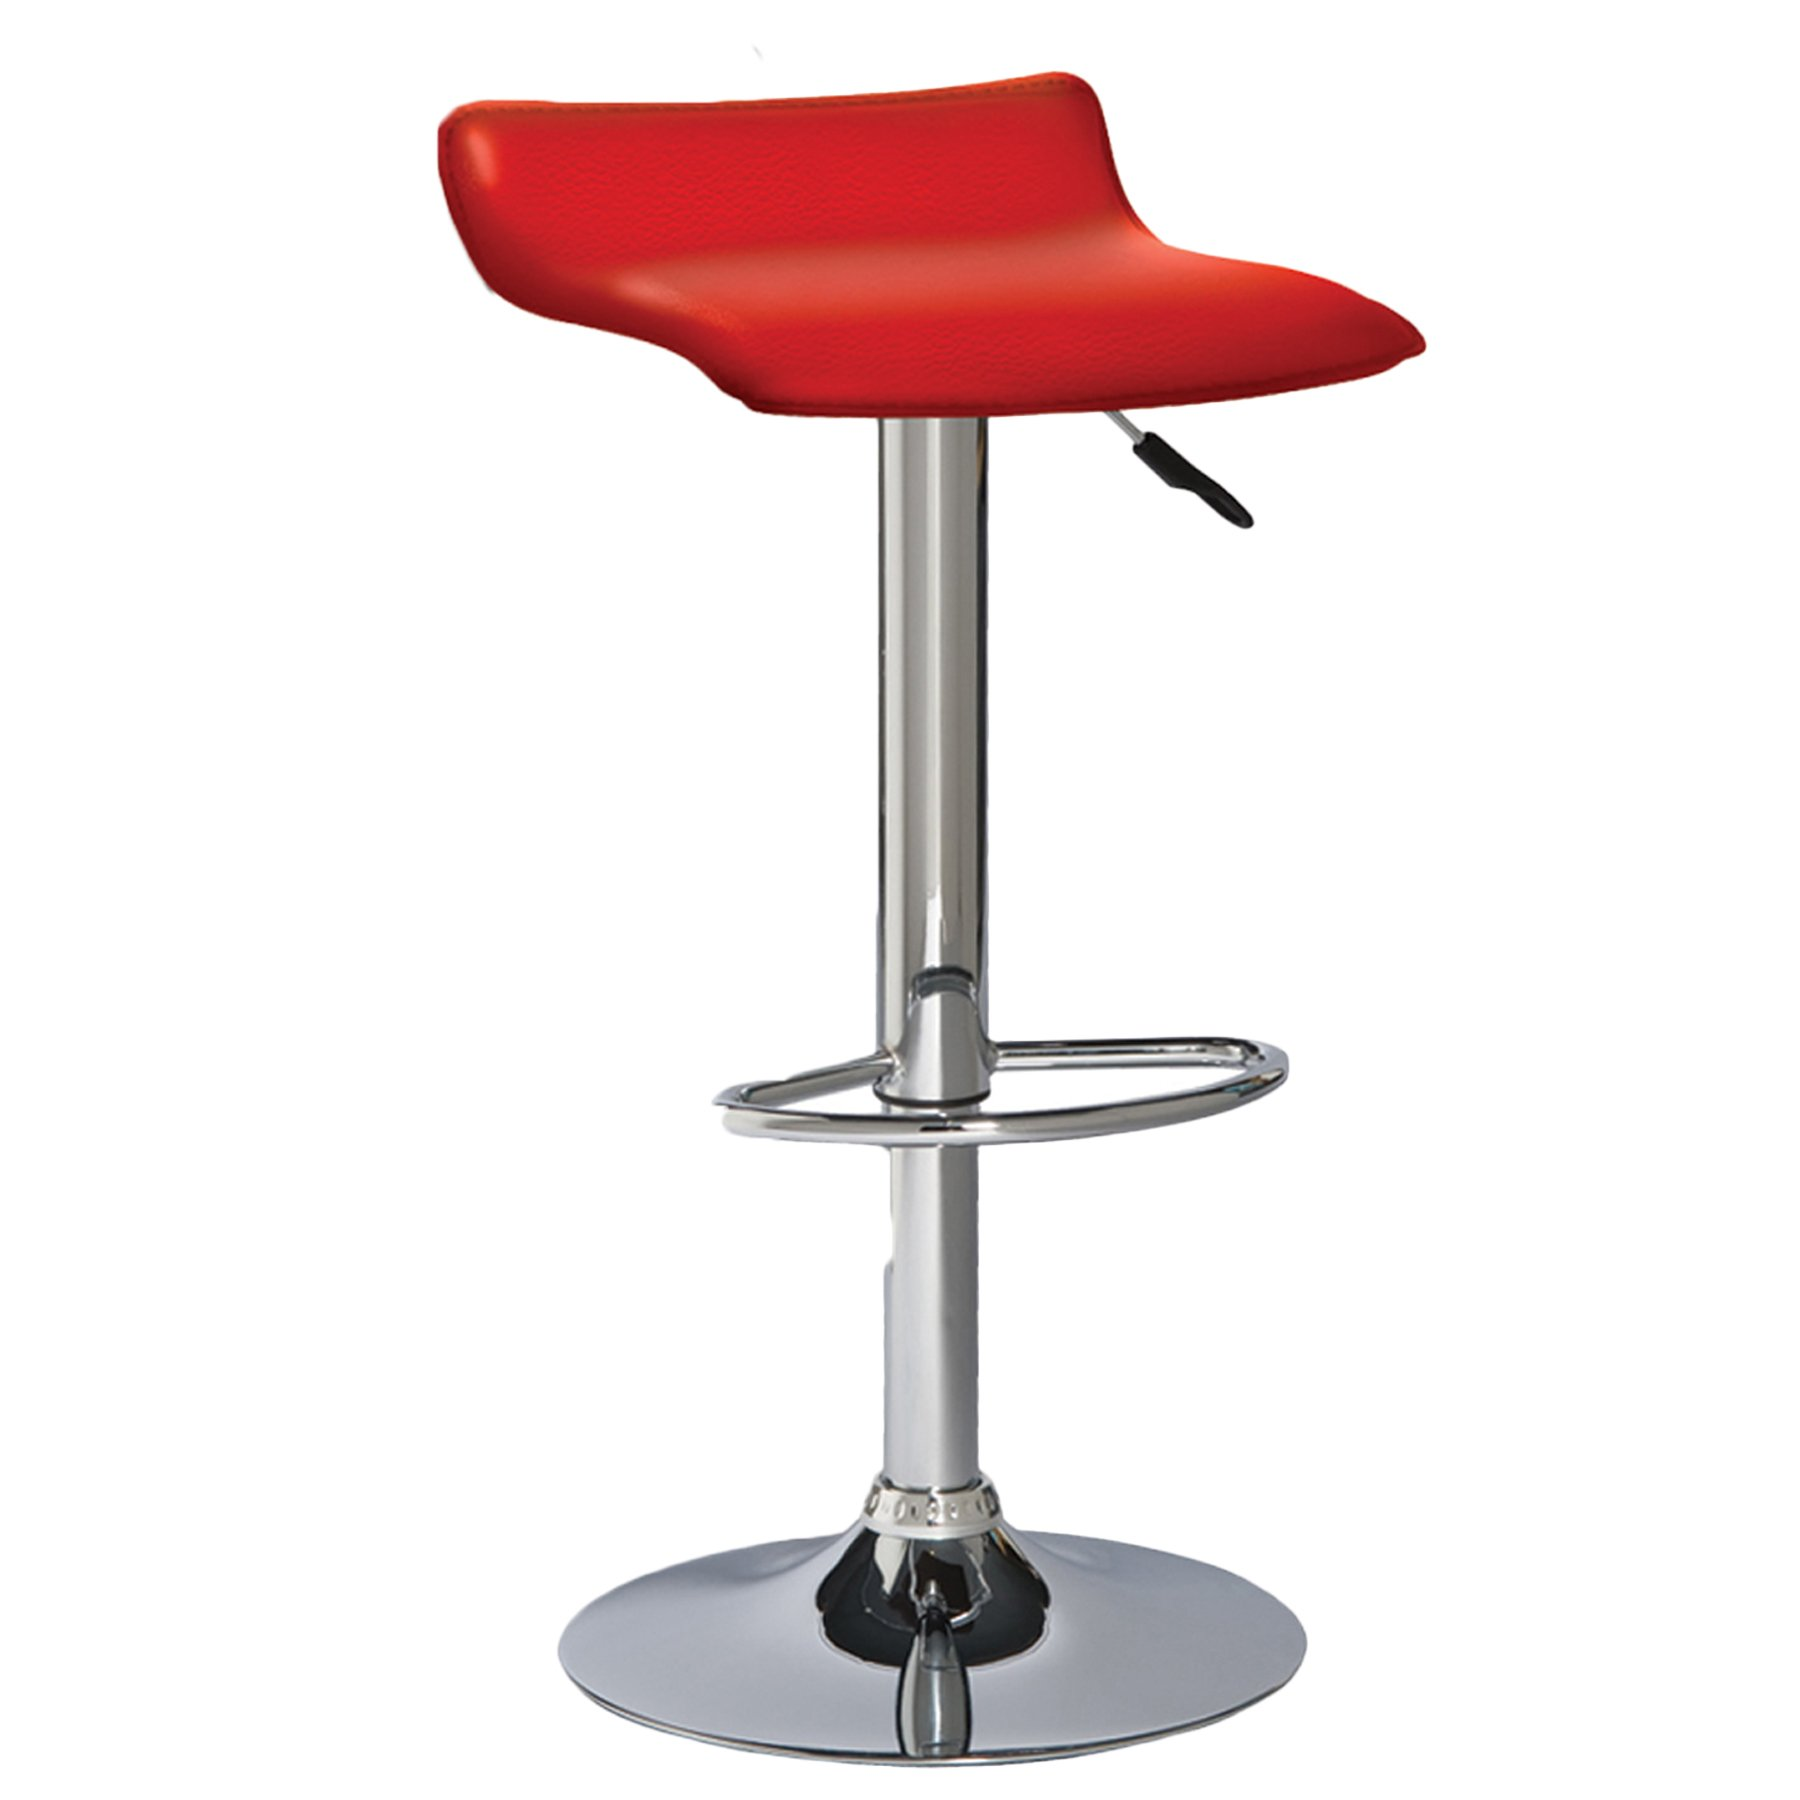 Leick Red Adjustable Height Swivel Bar Stool-Set of 2